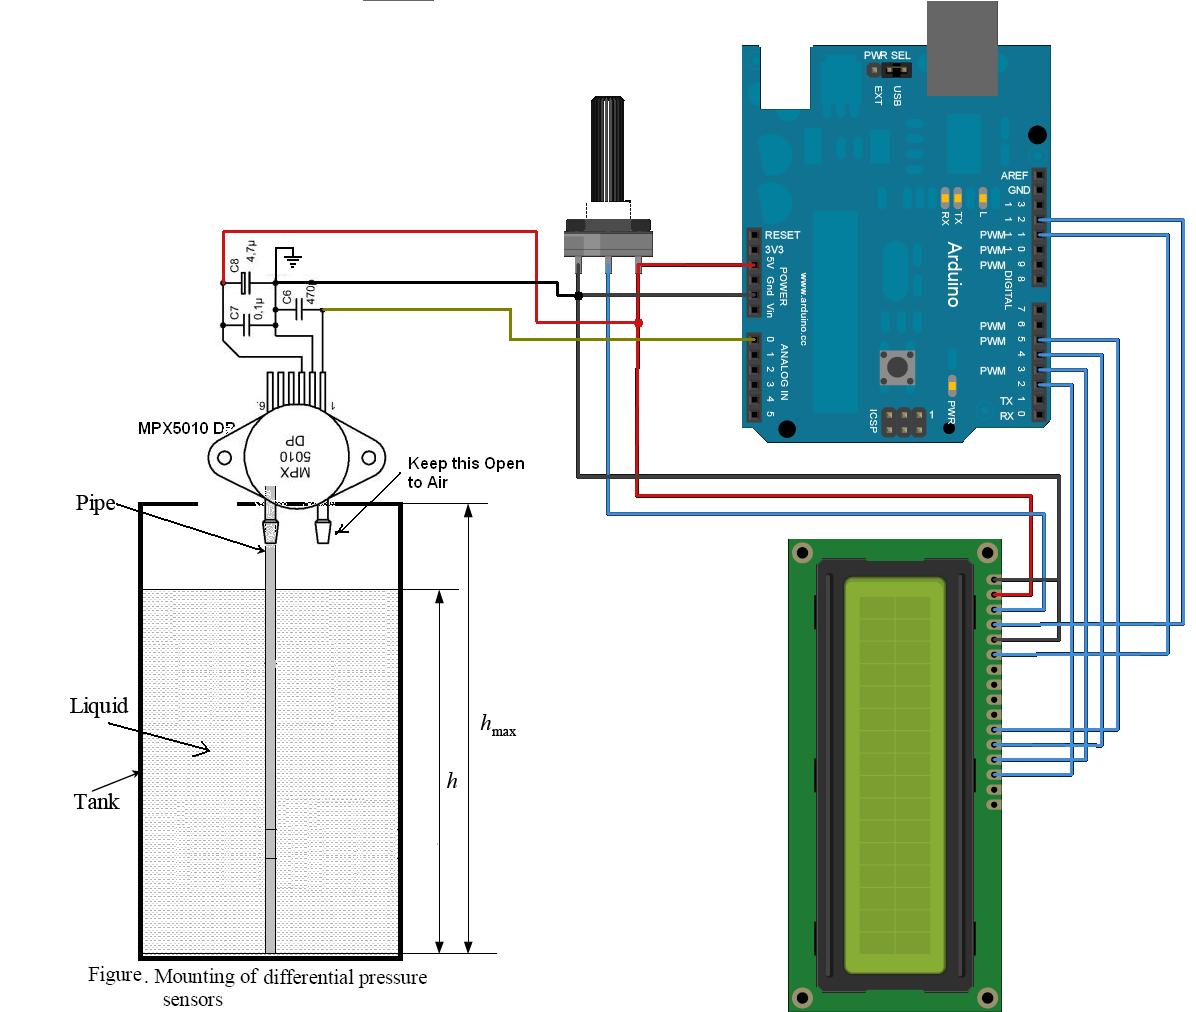 hight resolution of water level measurement using arduino circuits4you com wiring diagram as well as water depth pressure sensor circuit diagram